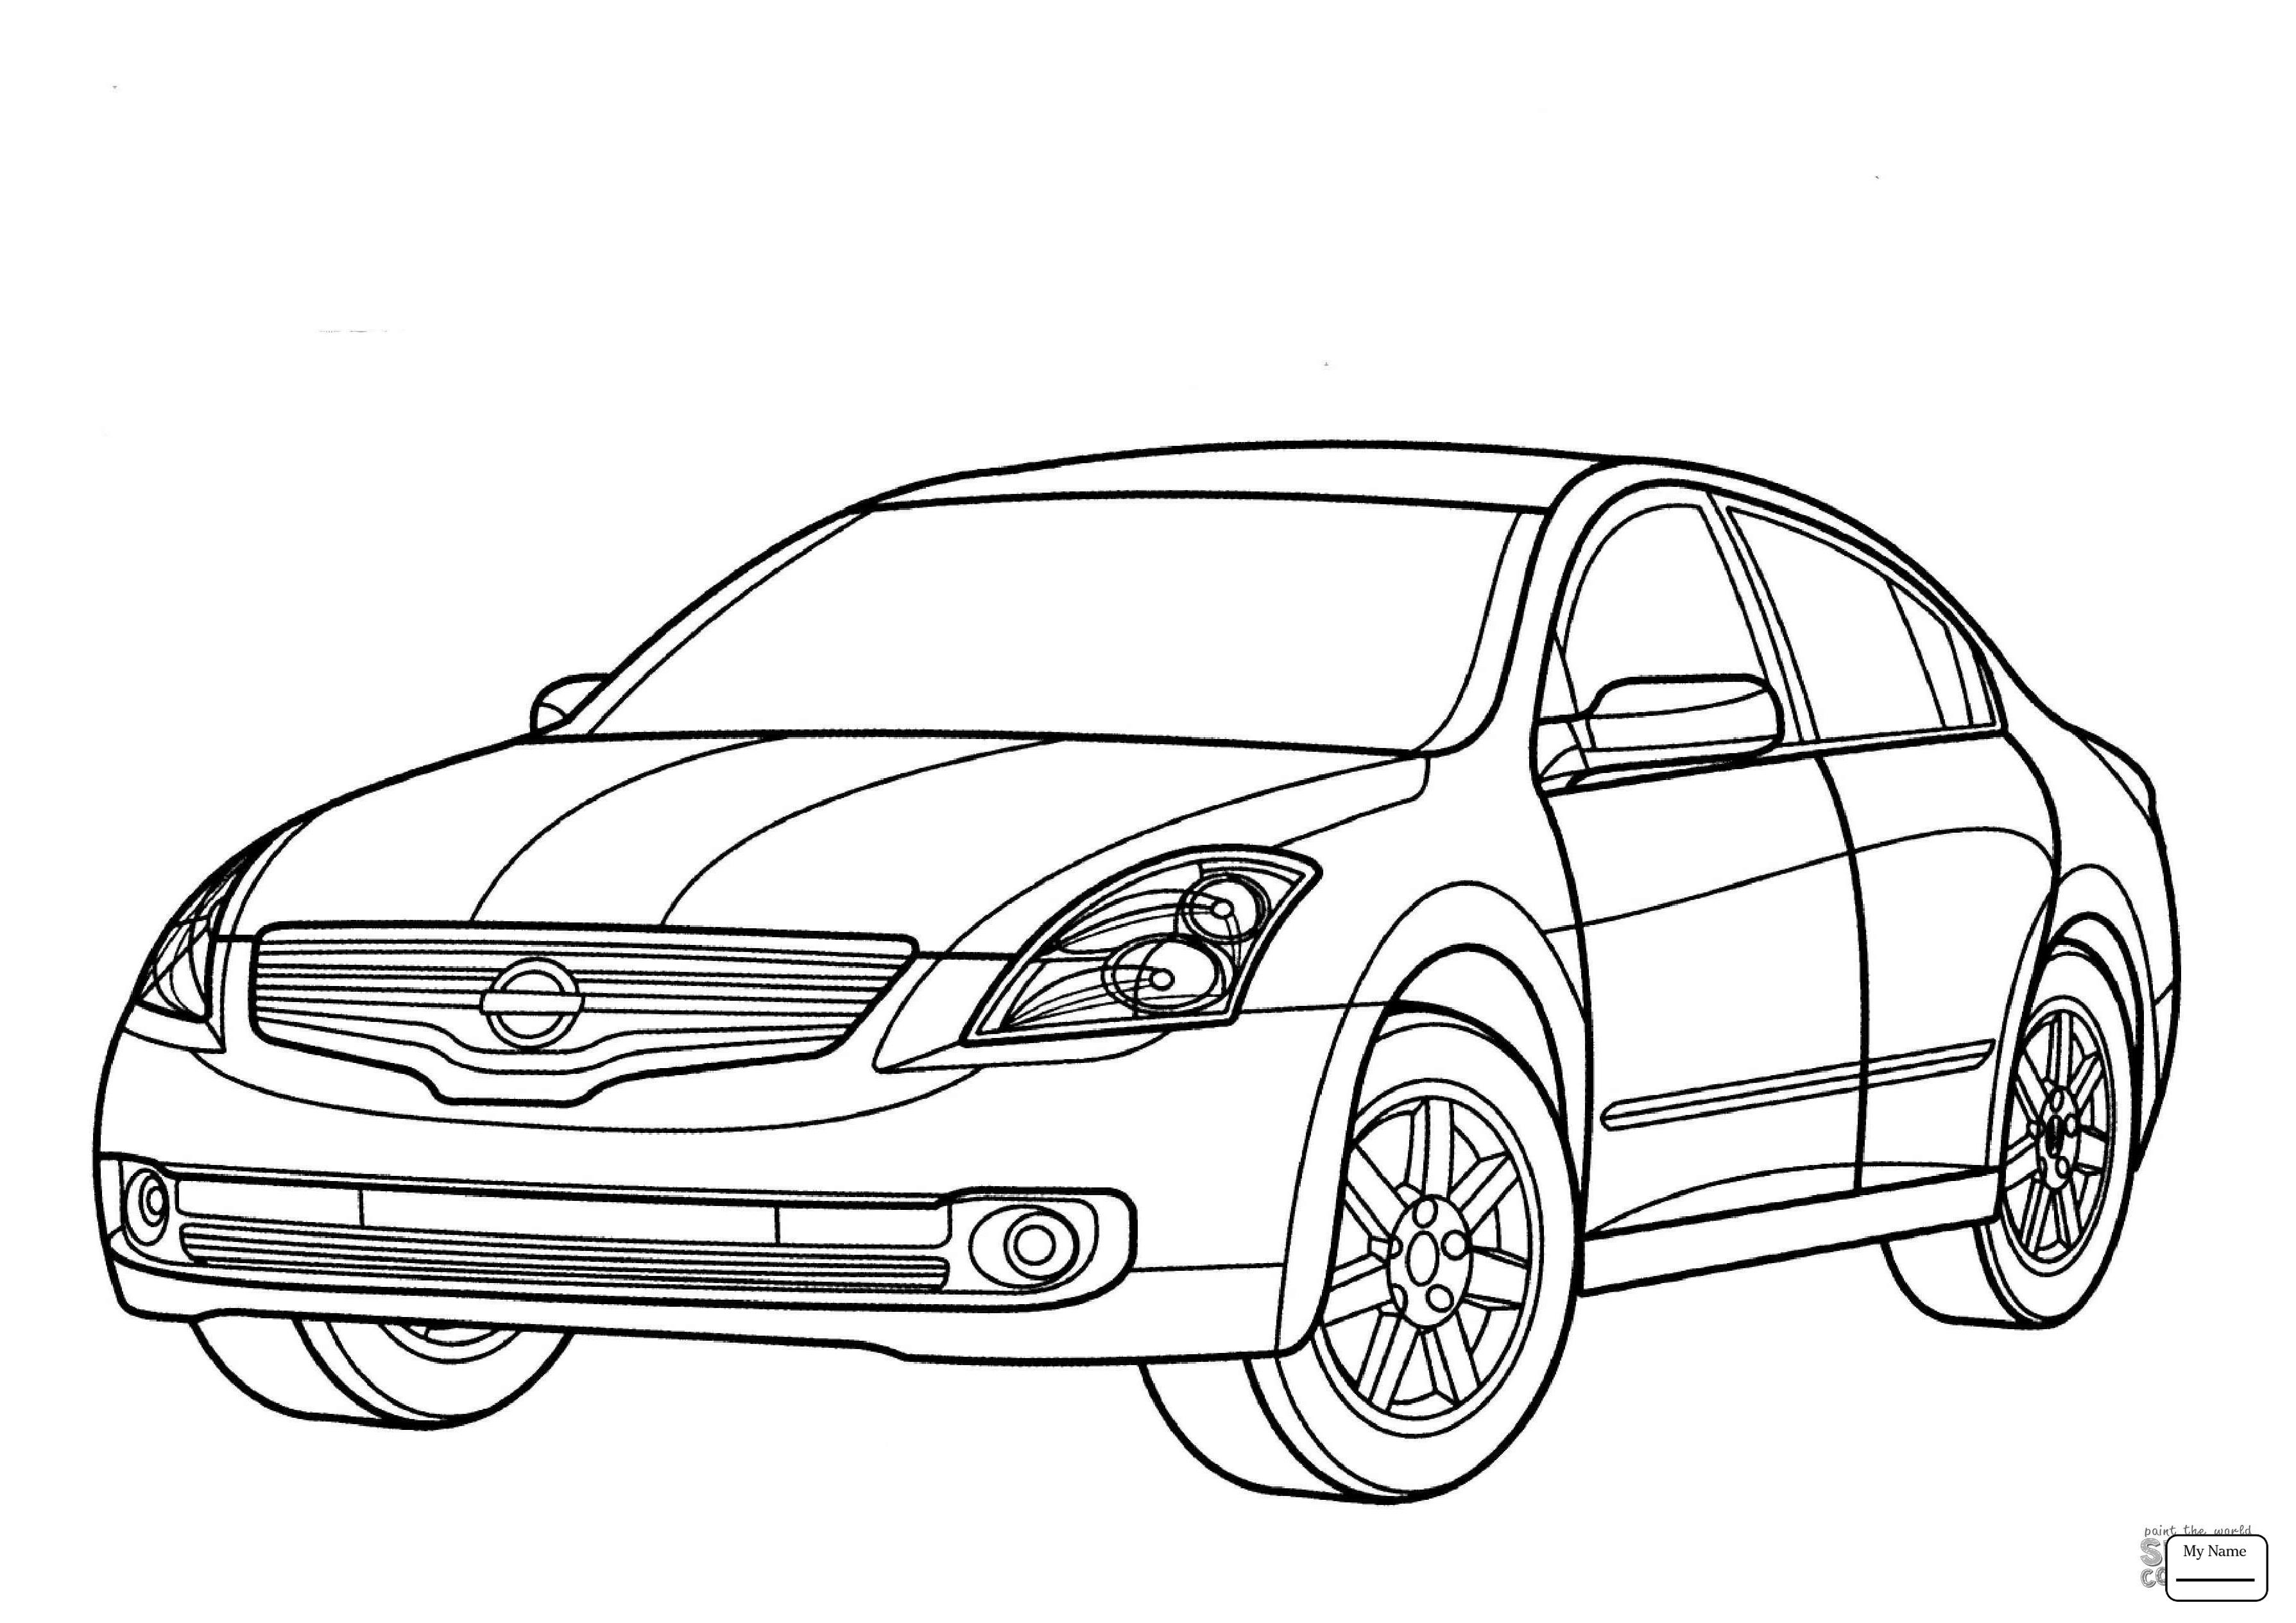 skyline car drawing at getdrawings com